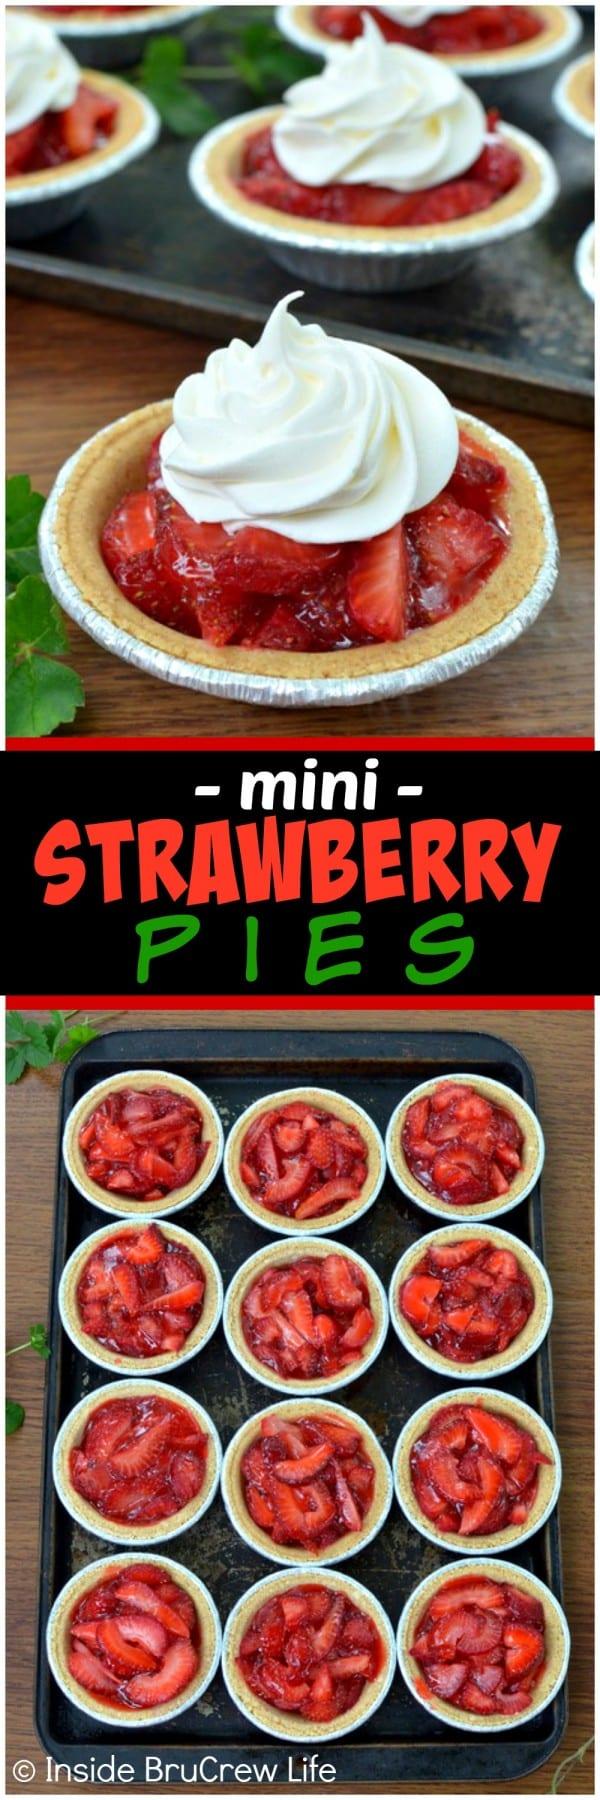 Mini Strawberry Pies - fresh berries and Jello make these cute little pie crusts the perfect summer dessert recipe!